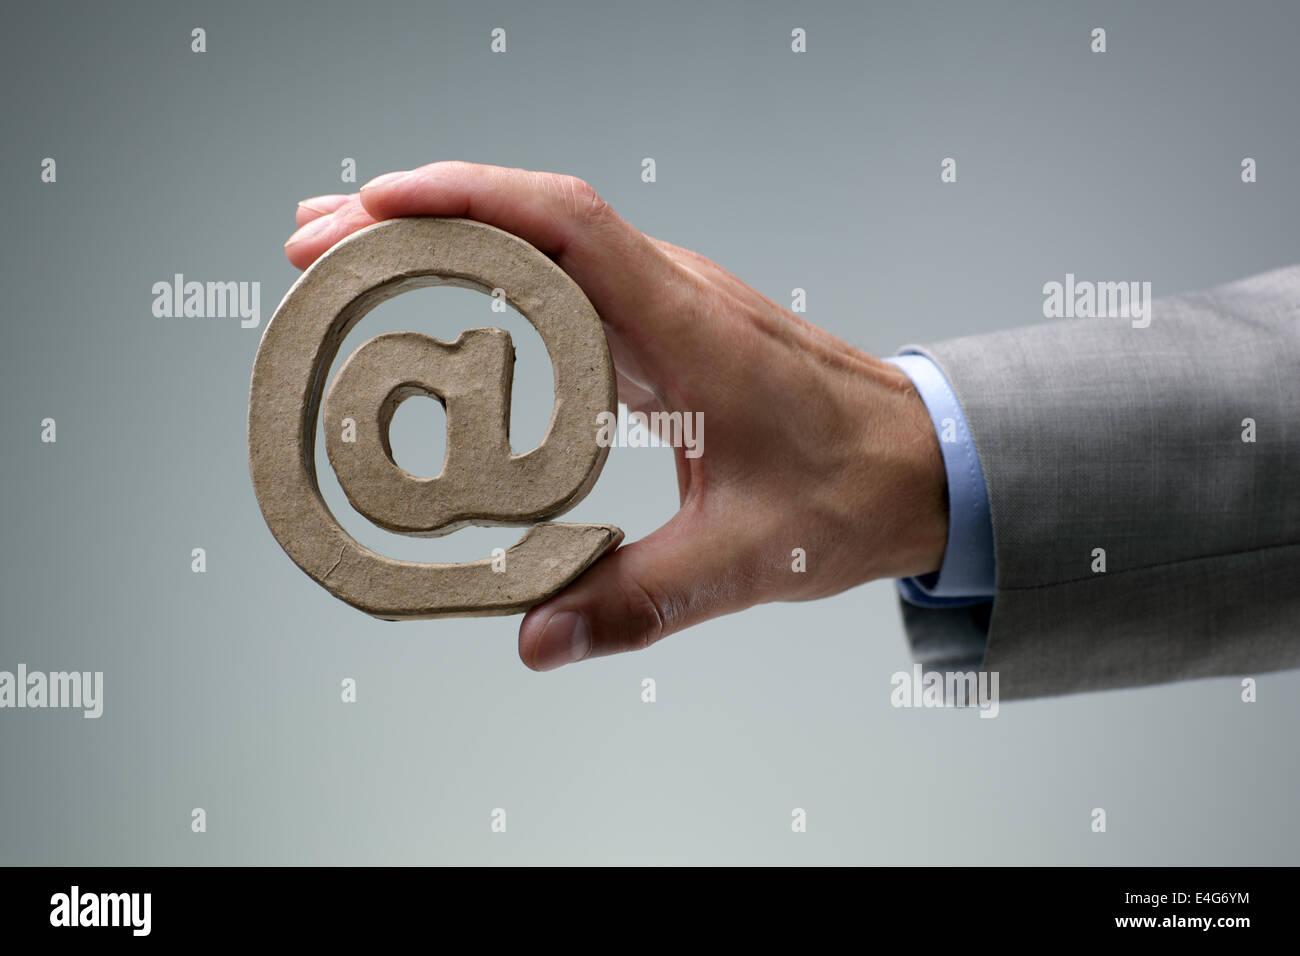 E-mail @ simbolo Immagini Stock